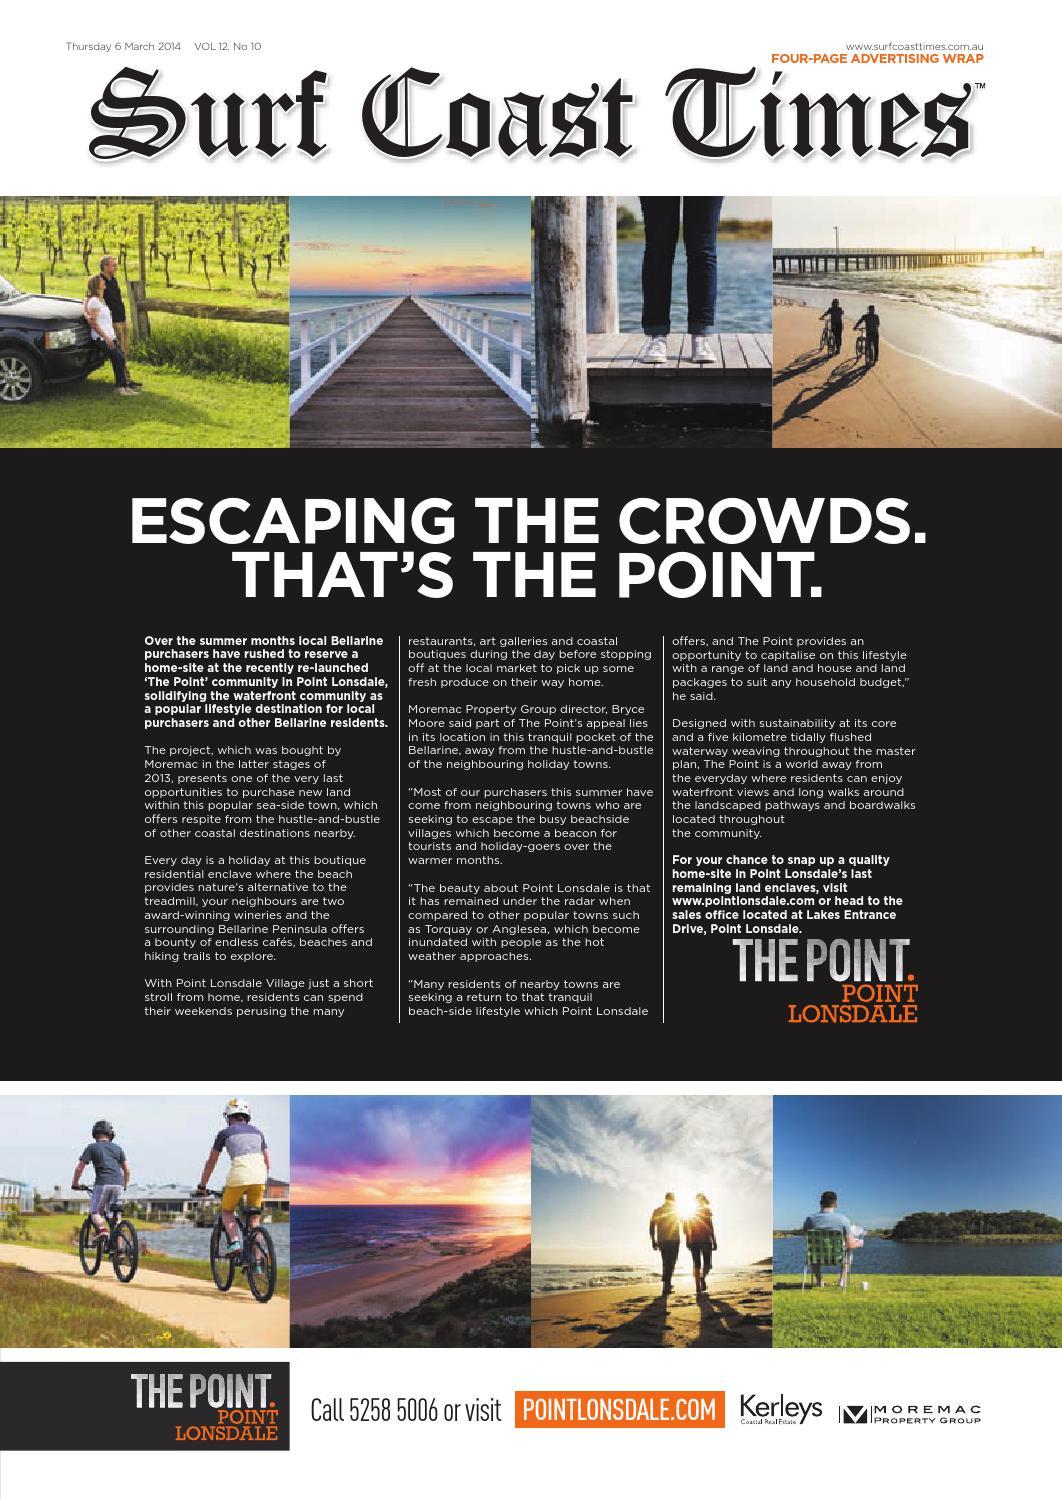 Surf Coast Times: March 6, 2014 by Surf Coast News Australia